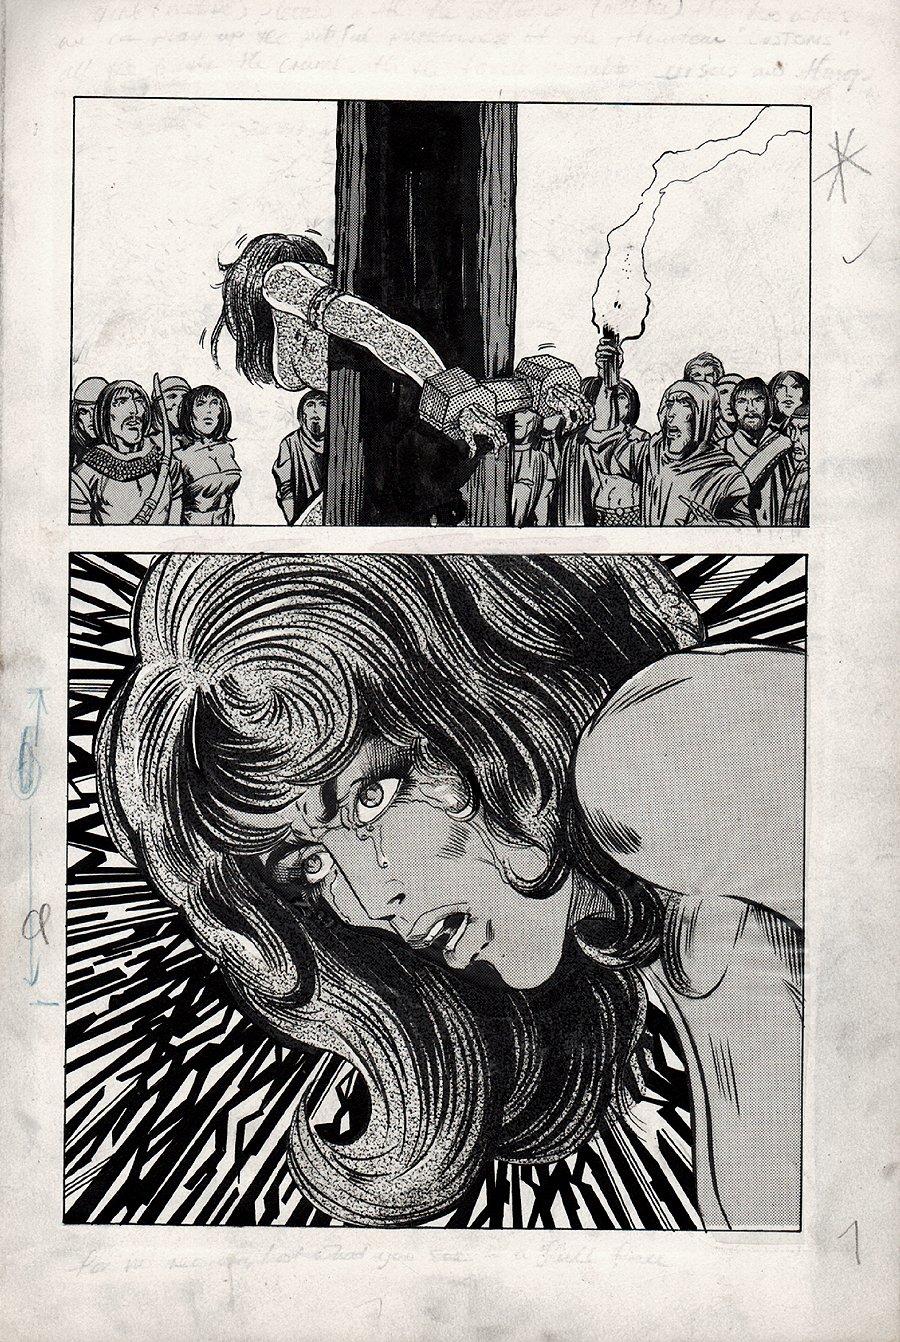 Kull Of Atlantis p 9 (Precursor To Conan The Barbarian #1) 1969-1970